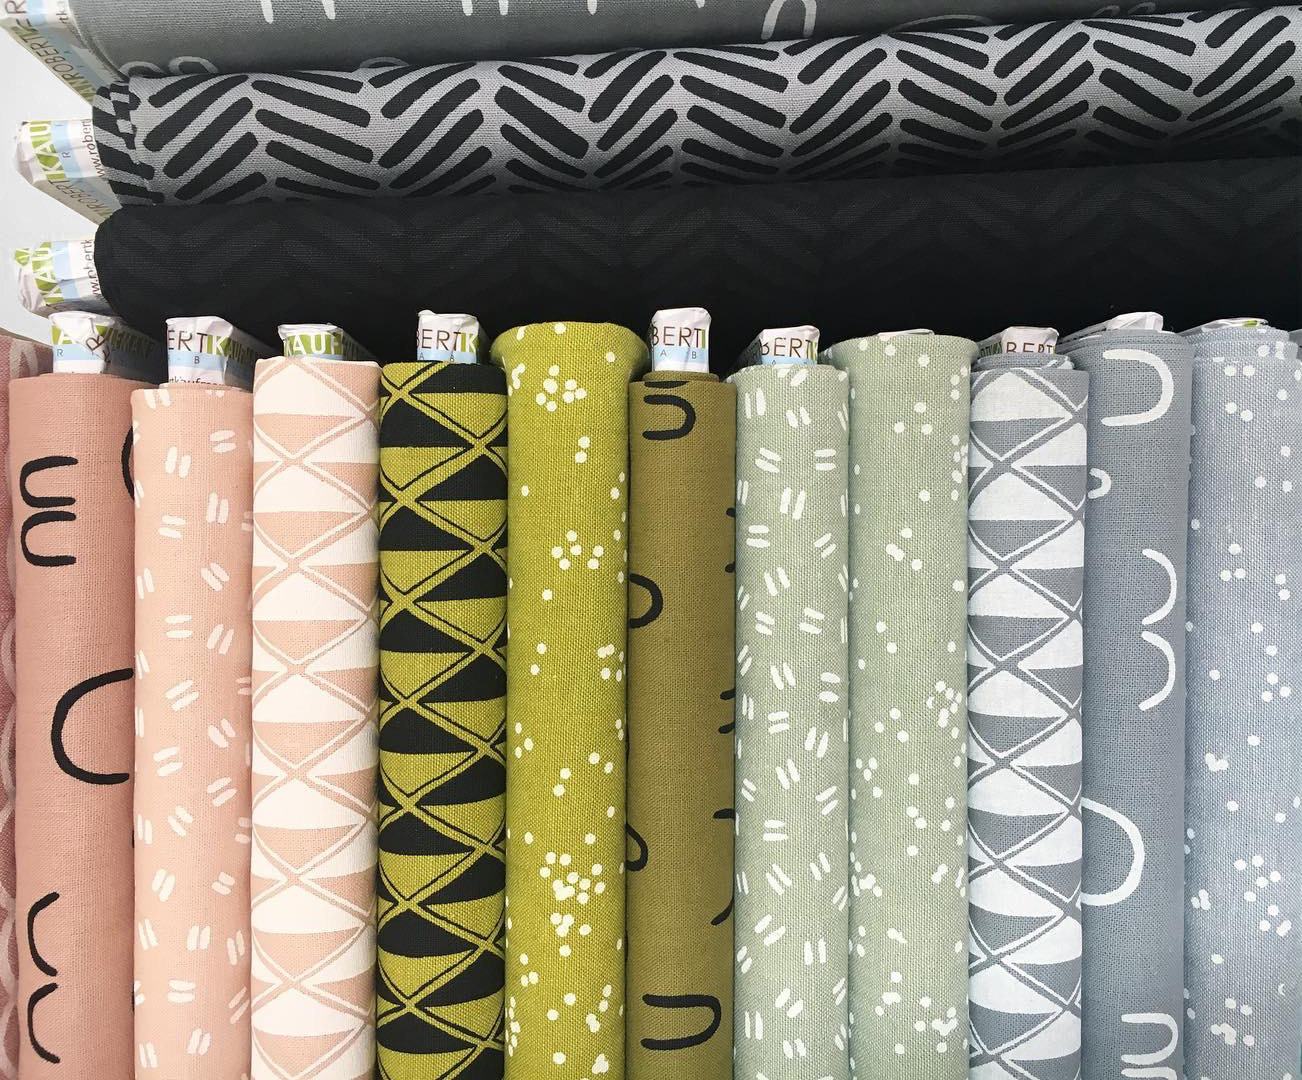 Arroyo Fabrics by Erin Dollar.jpg